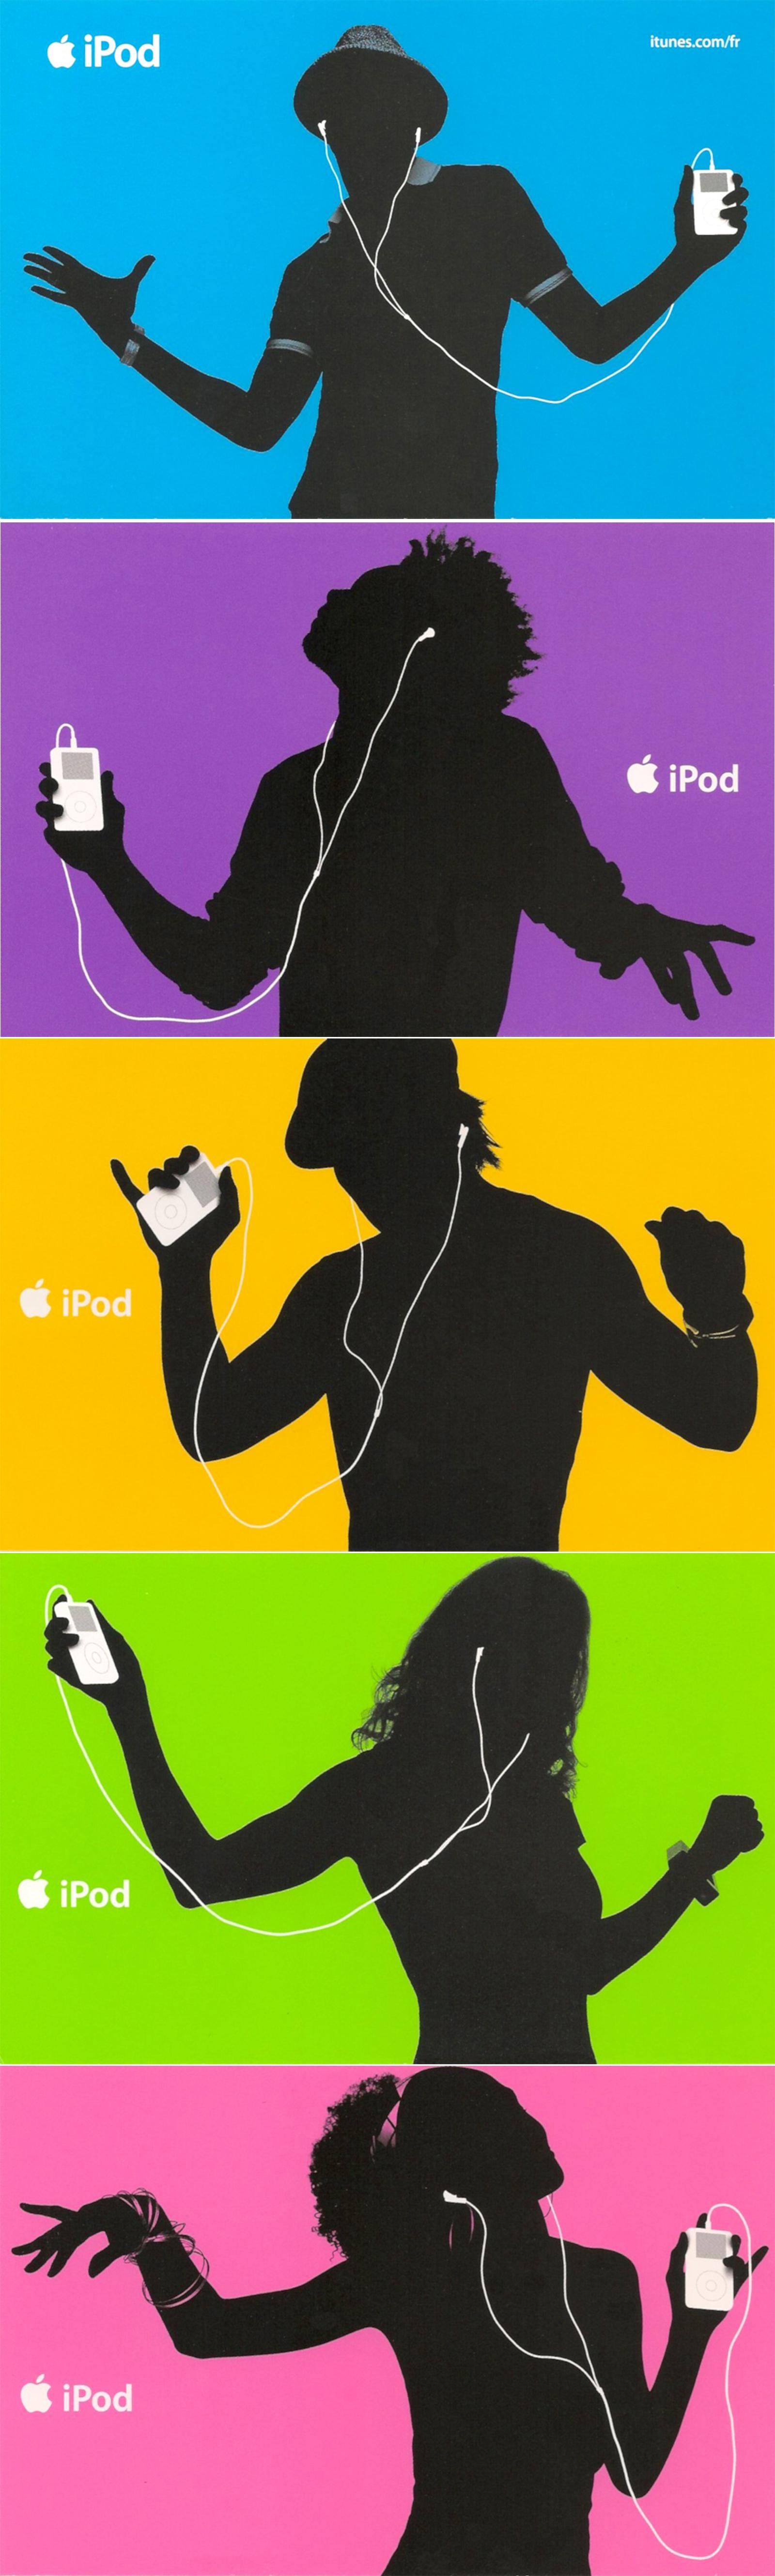 iPod+iTunes en cinq couleurs